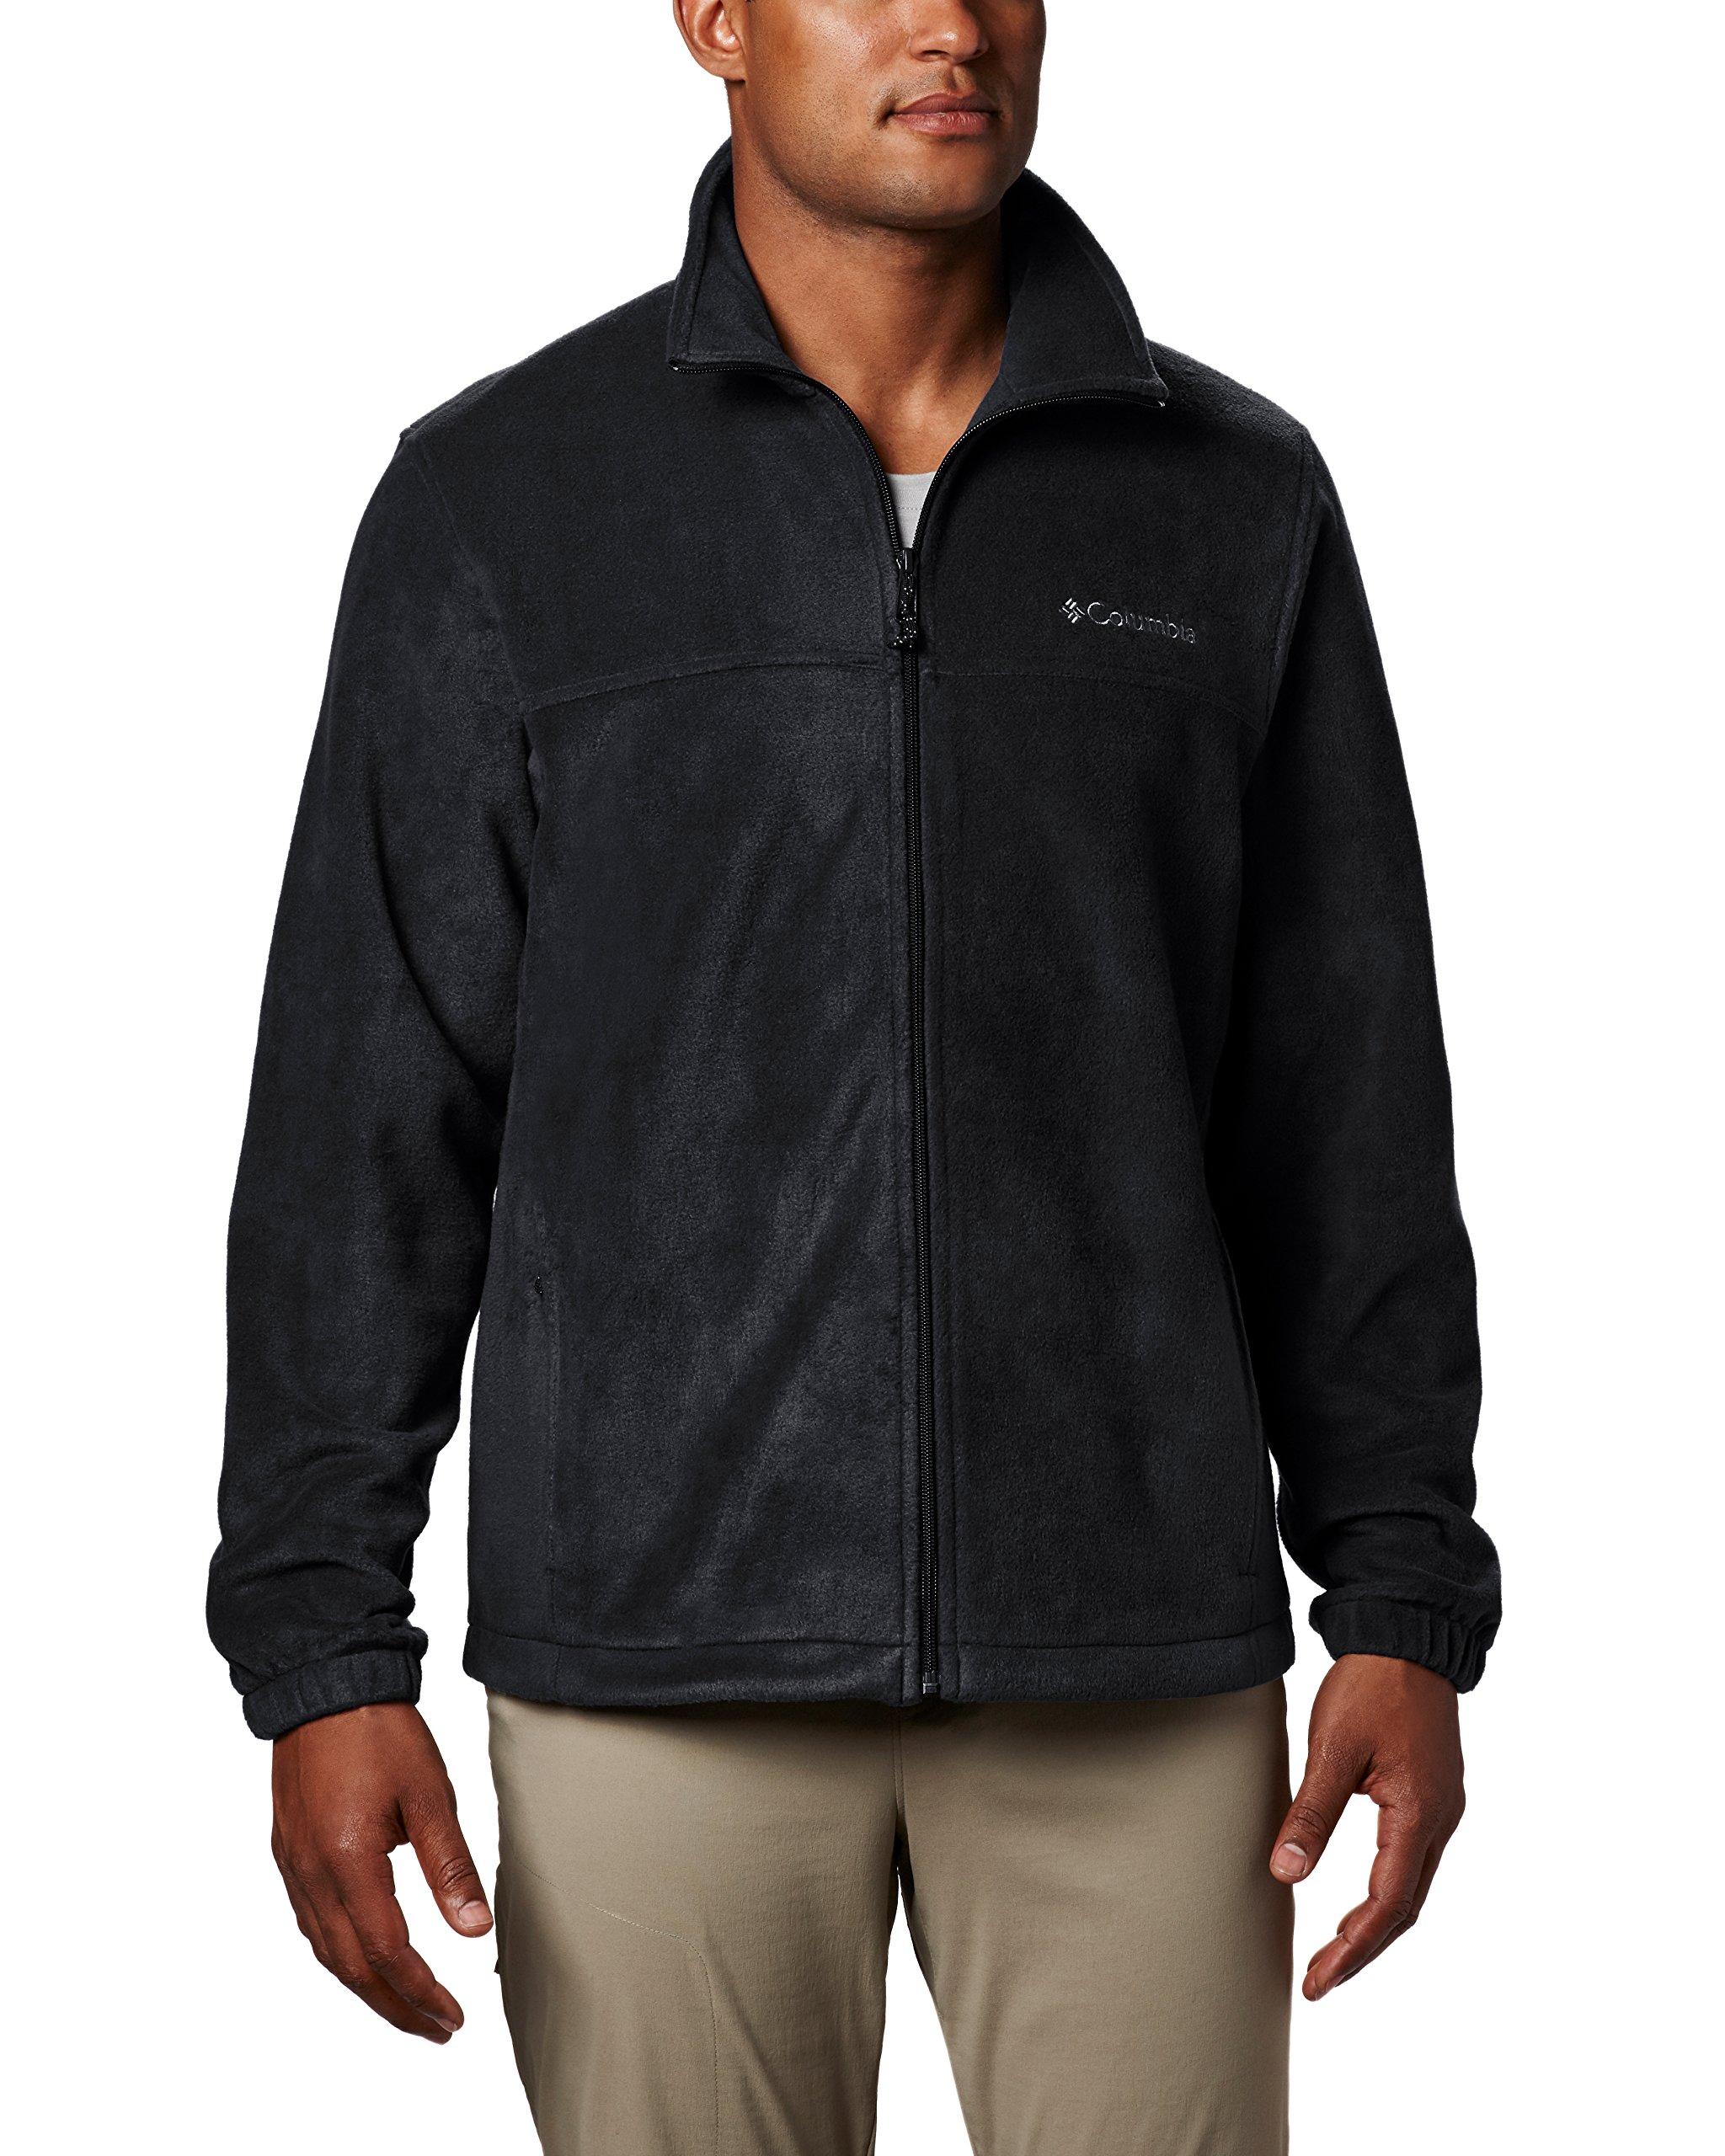 Columbia Men's Steens Mountain Full Zip 2.0 Soft Fleece Jacket, Black, Medium by Columbia